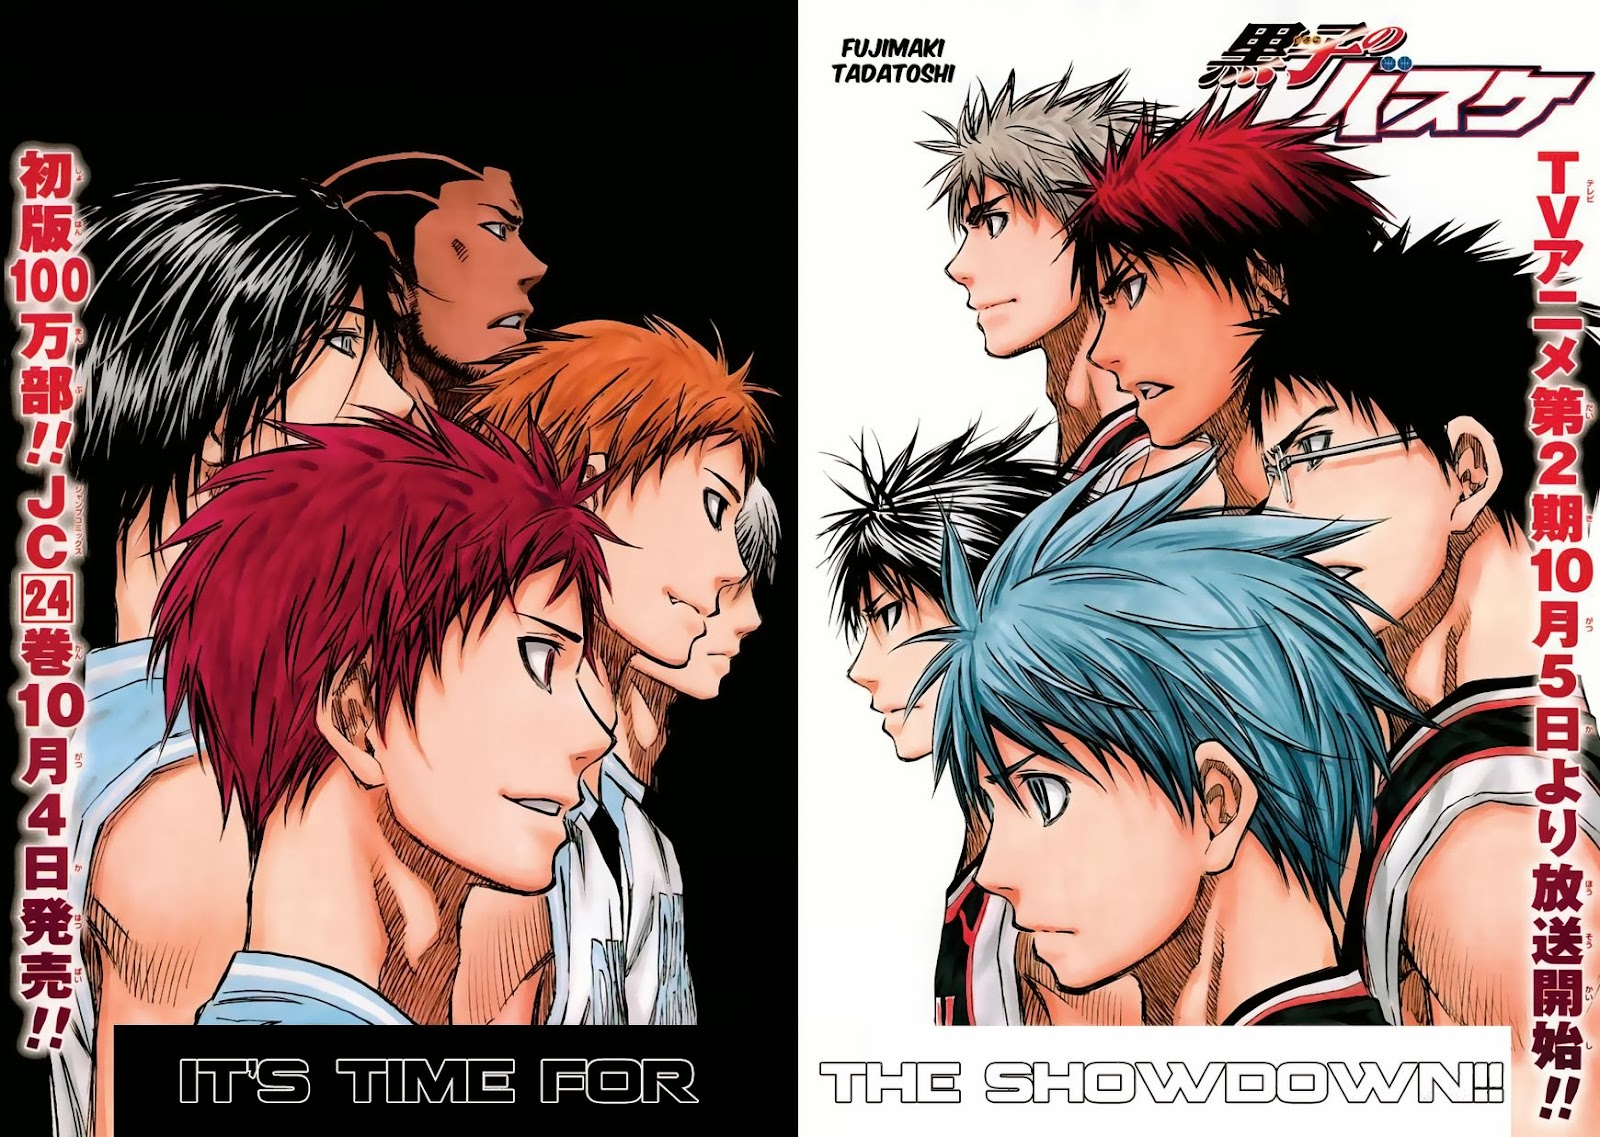 Kuroko no Basket Manga Chapter 231 - Image 02-03